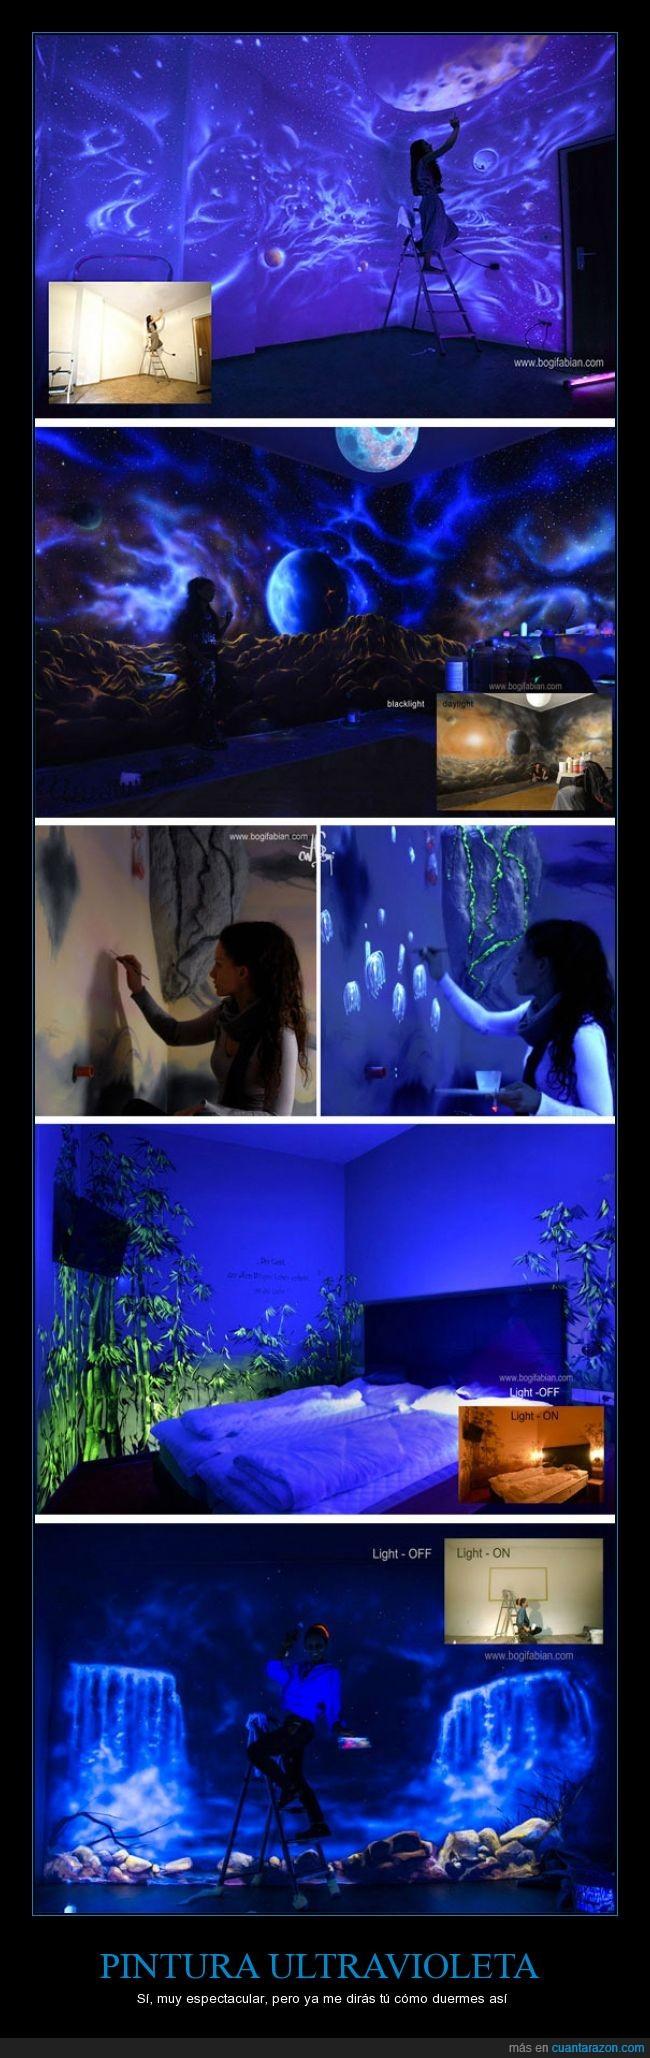 color,dormir,iluminado,luz,oculto,oscuridad,oscuro,pintura,ultravioleta,ver